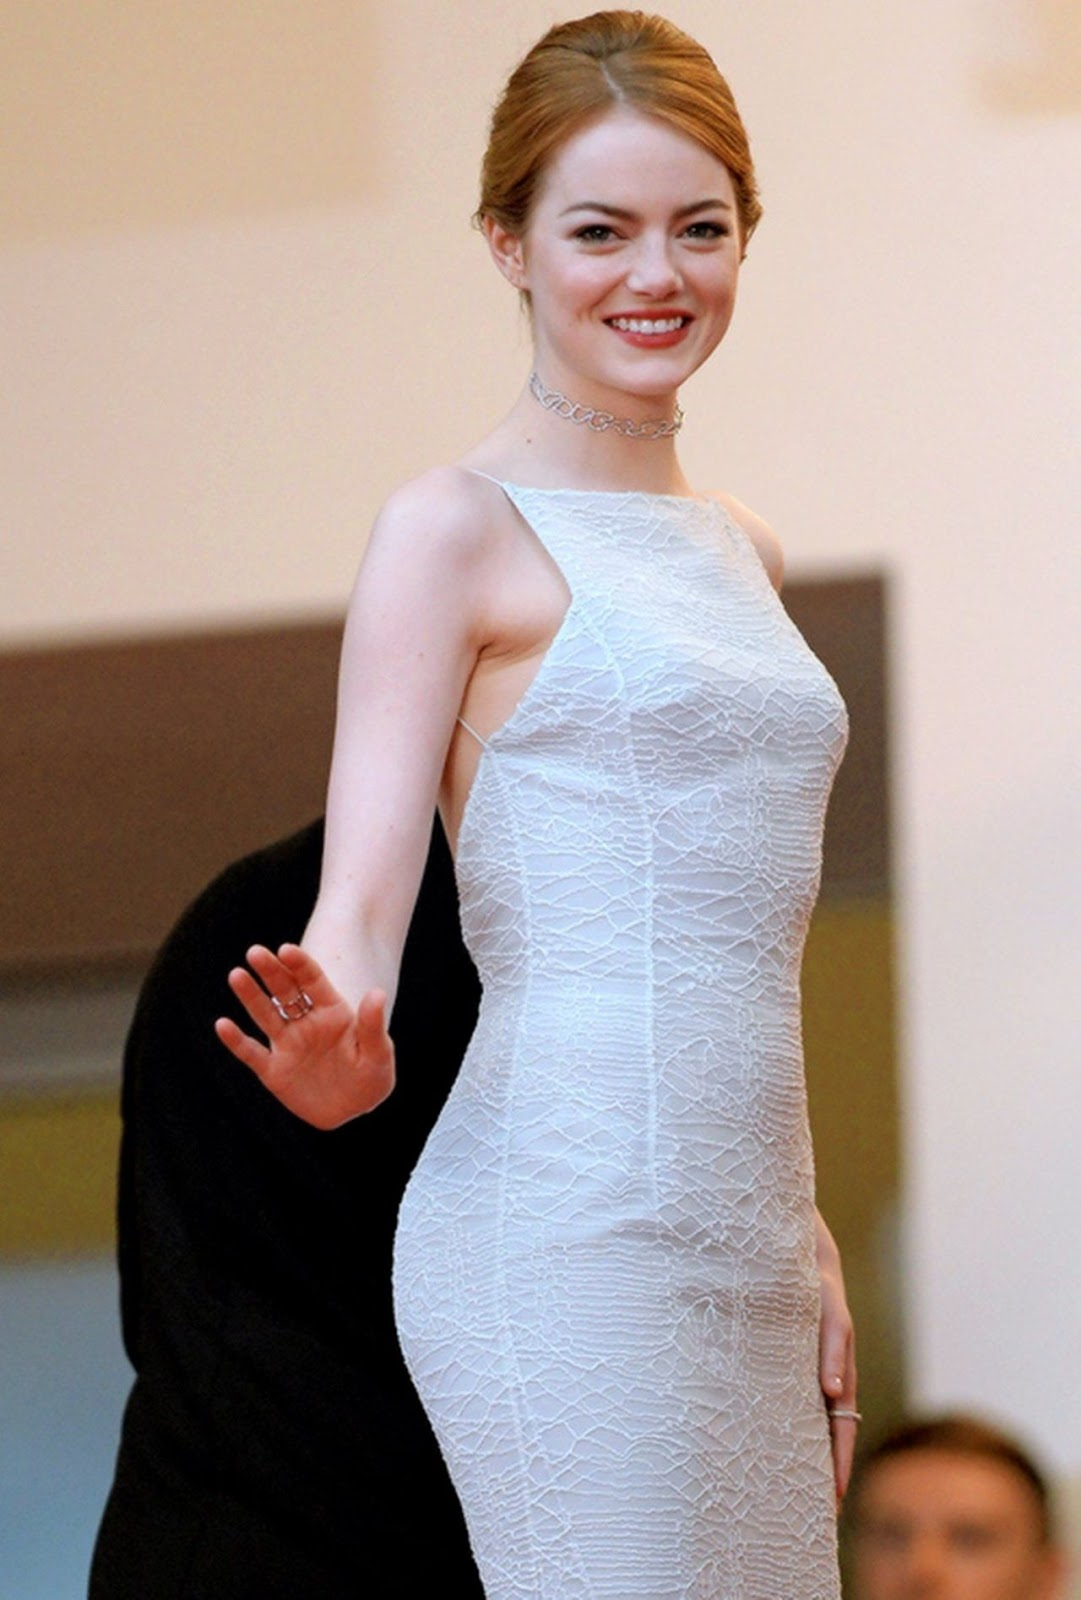 Full HQ Photos of Emma Stone Irrational Man Premiere 2015 Cannes Film Festival